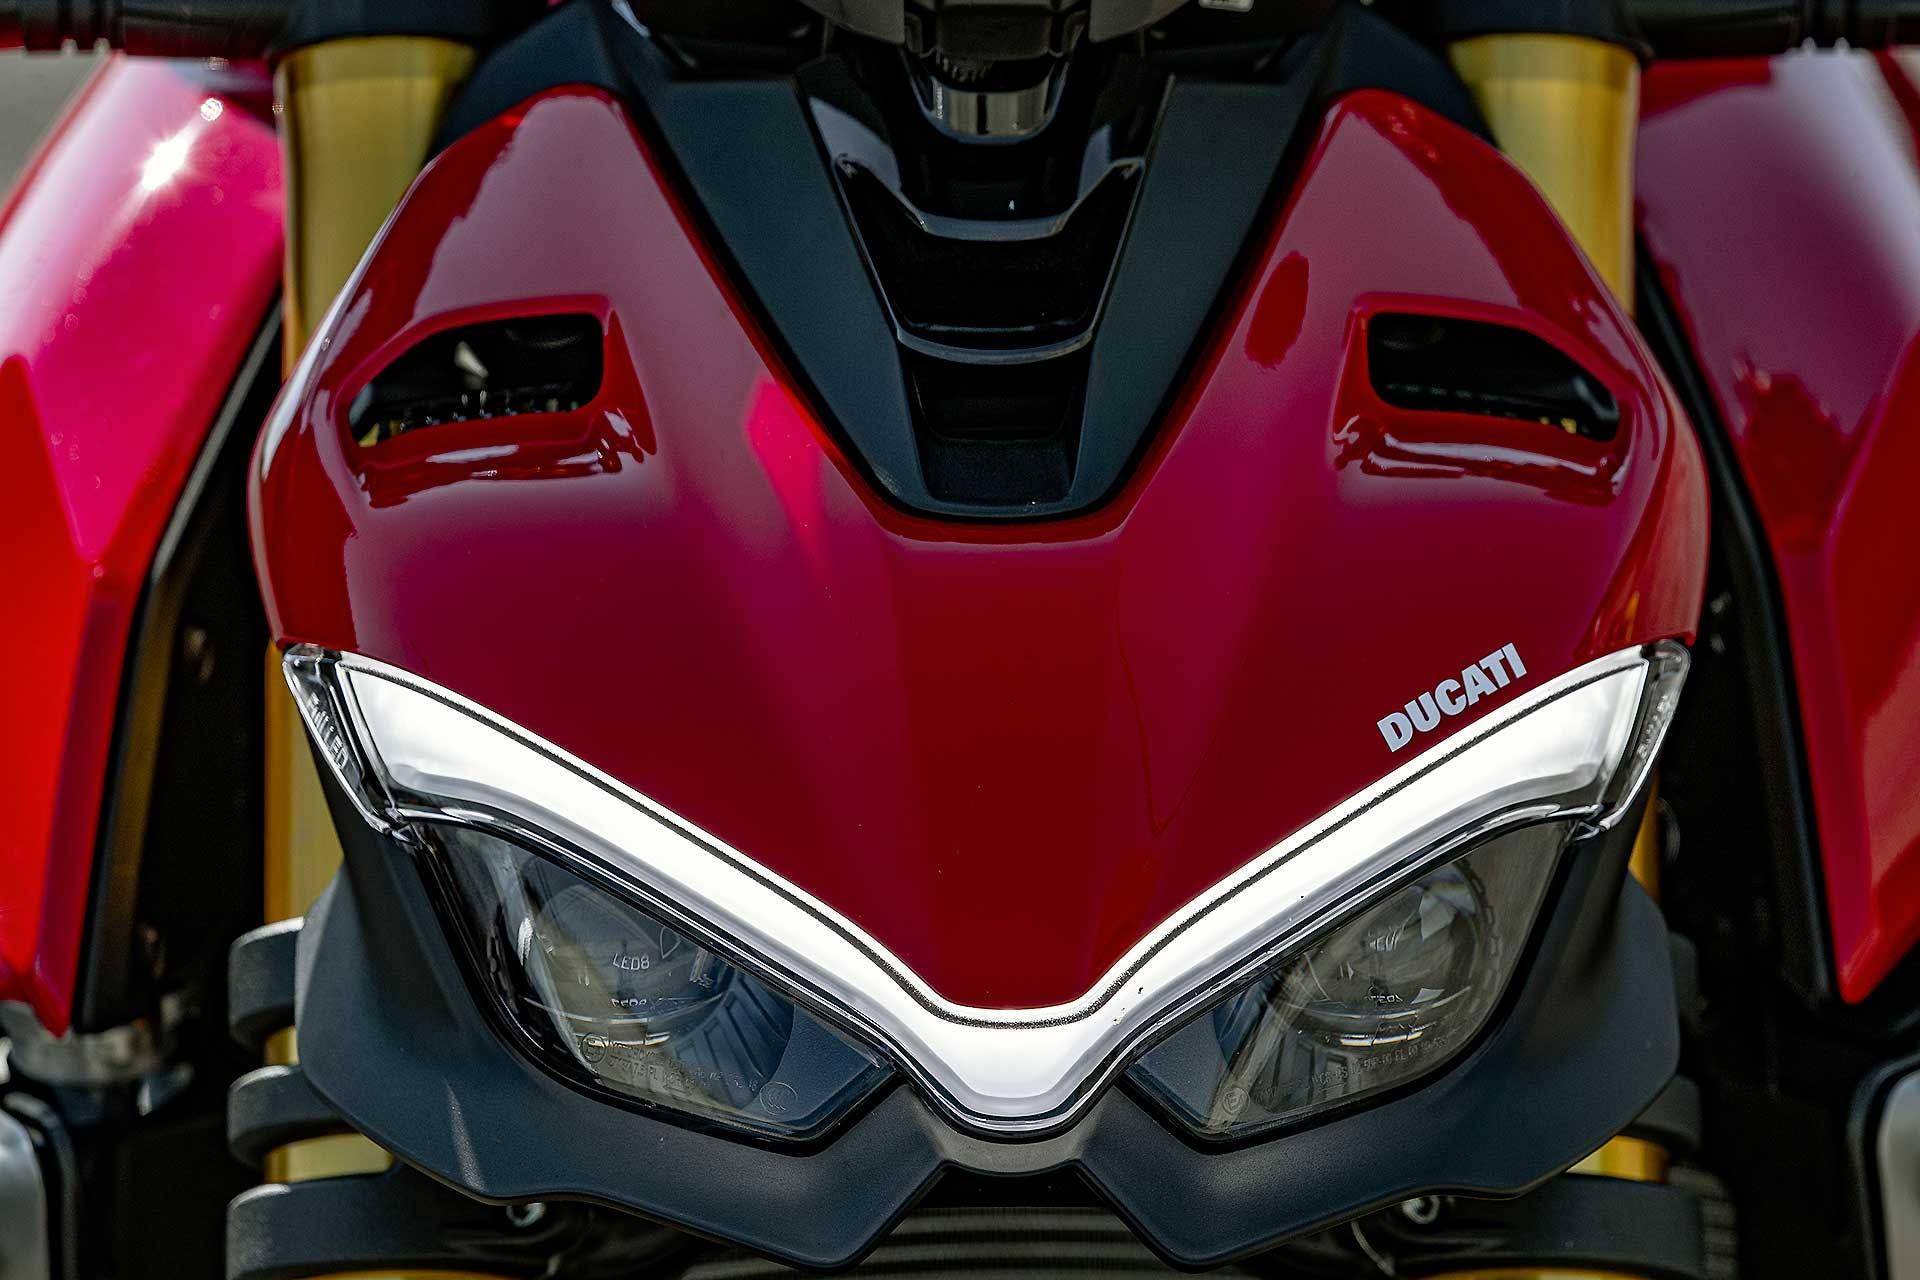 Ducati Streetfighter V4 S rossa, faro